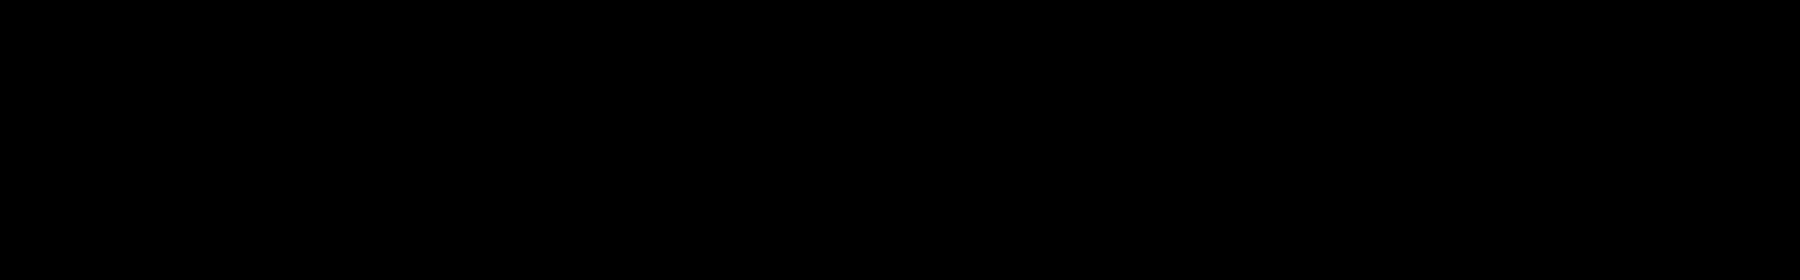 Riemann Analogue Chord Loops feat. Sierra Sam audio waveform